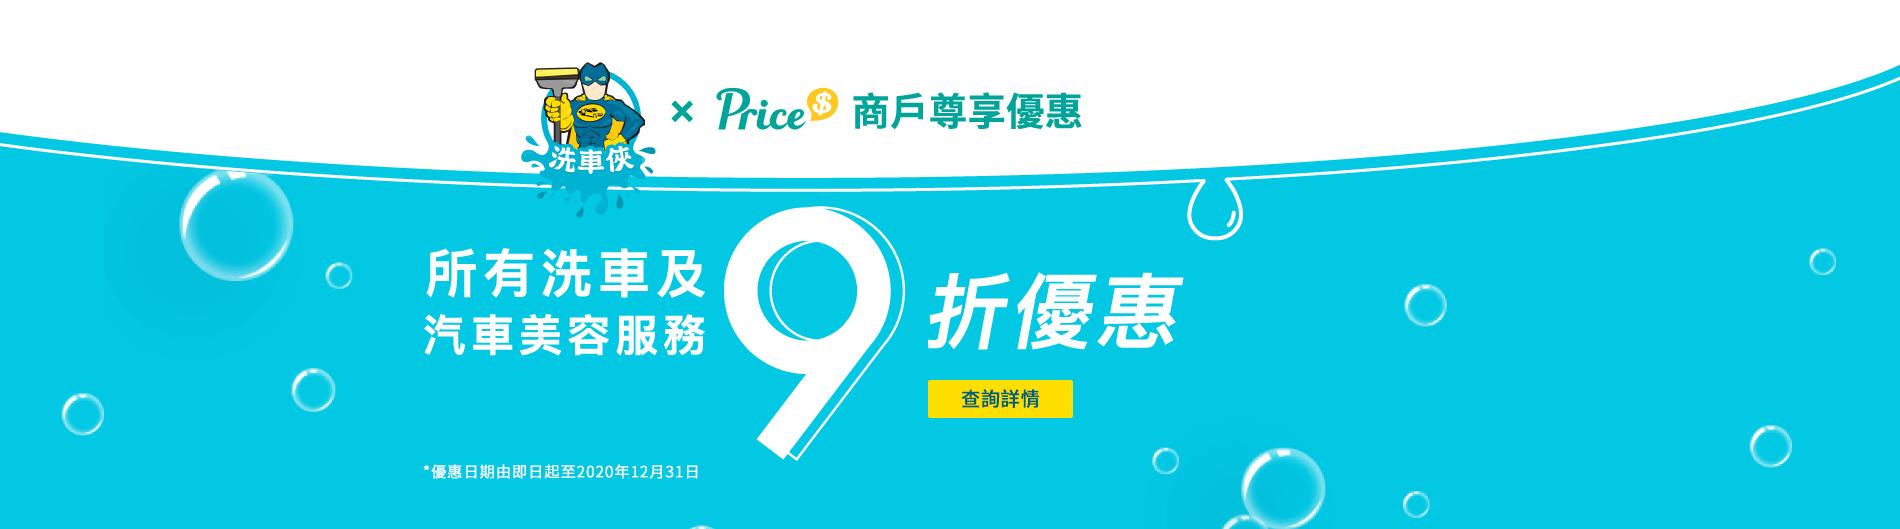 Price x 洗車俠 商戶專享優惠